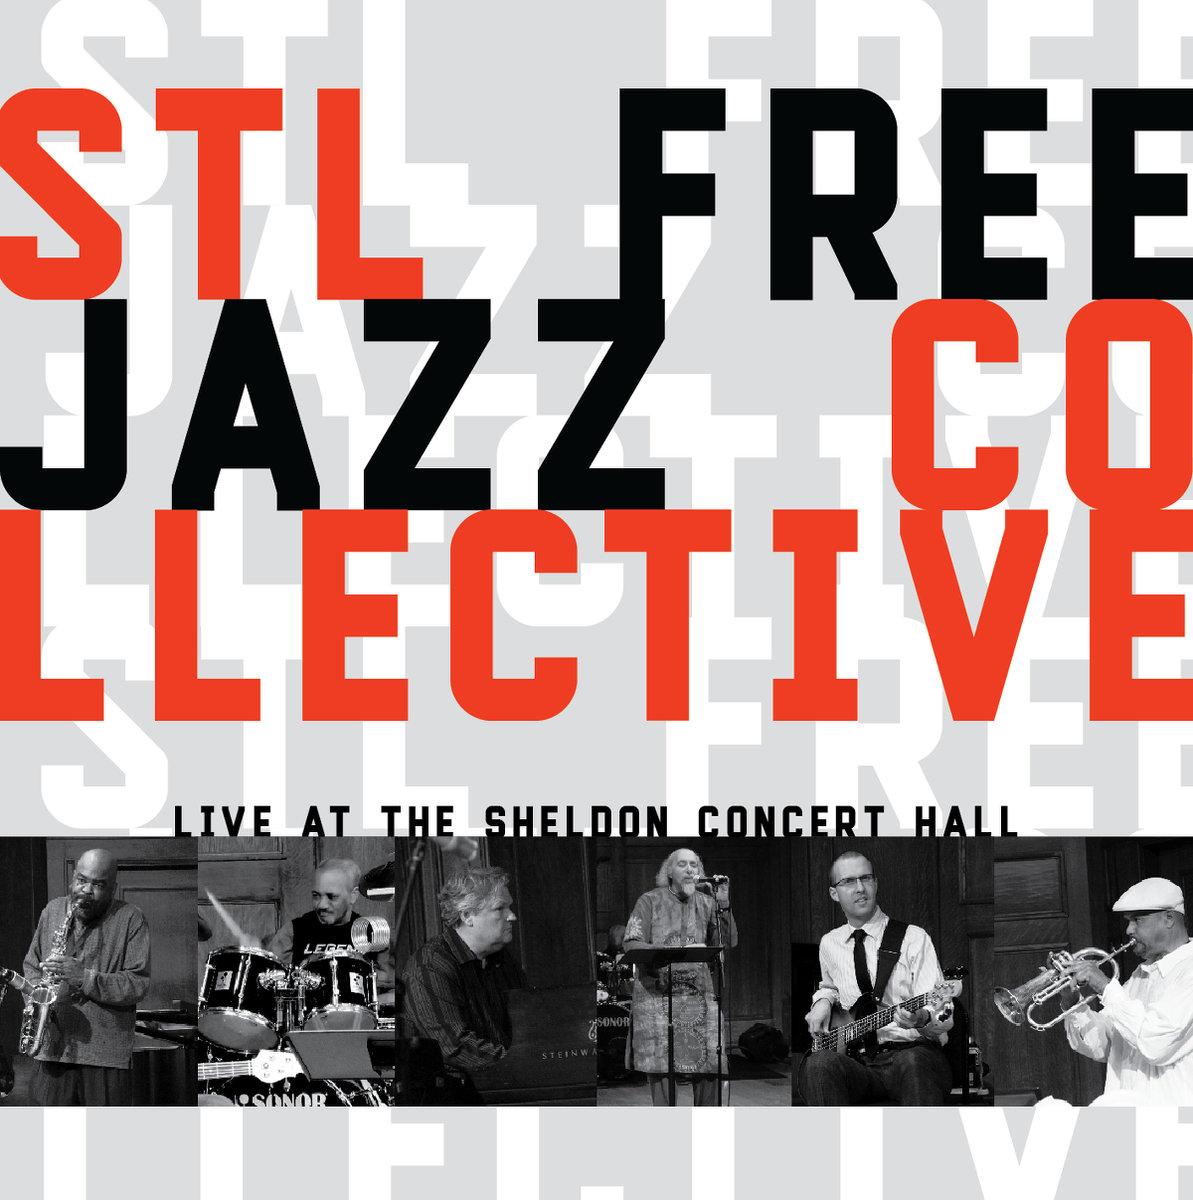 Live at the Sheldon Concert Hall